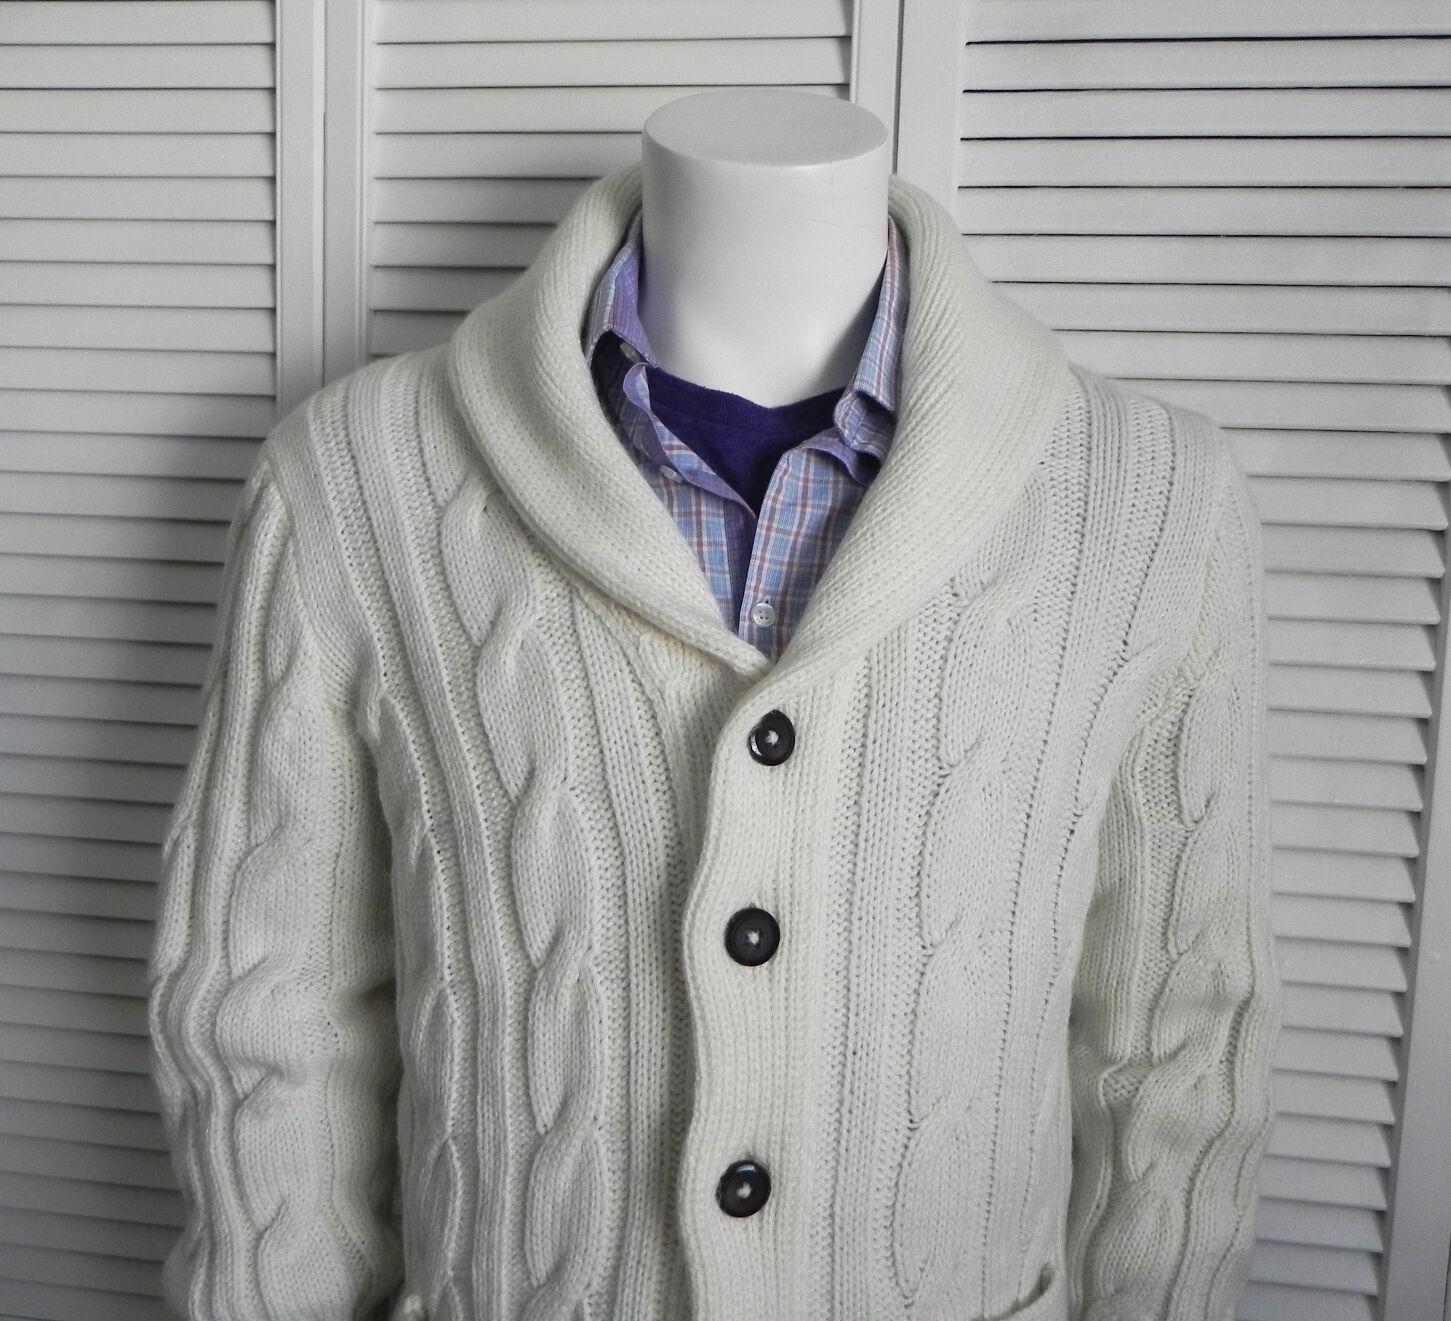 NEW  Herren SZ 2XL ALPACA Ivory Weiß Shawl Collar Knit Cable Cardigan Sweater PERU